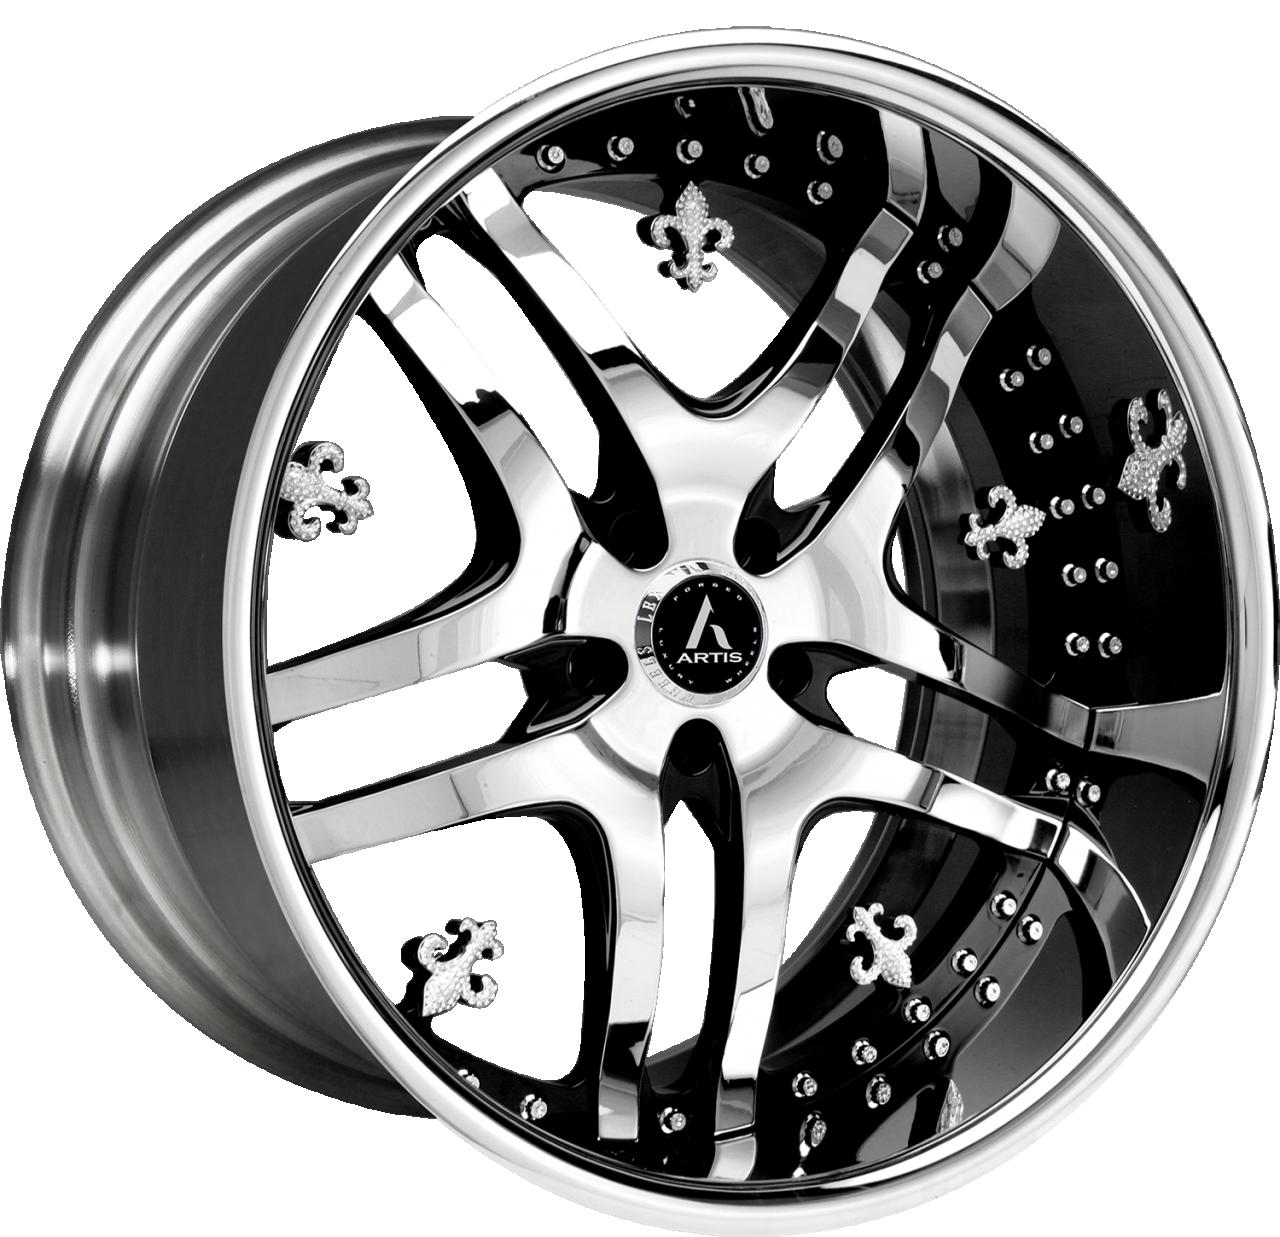 Artis Forged Biloxi wheel with Chrome and Black finish